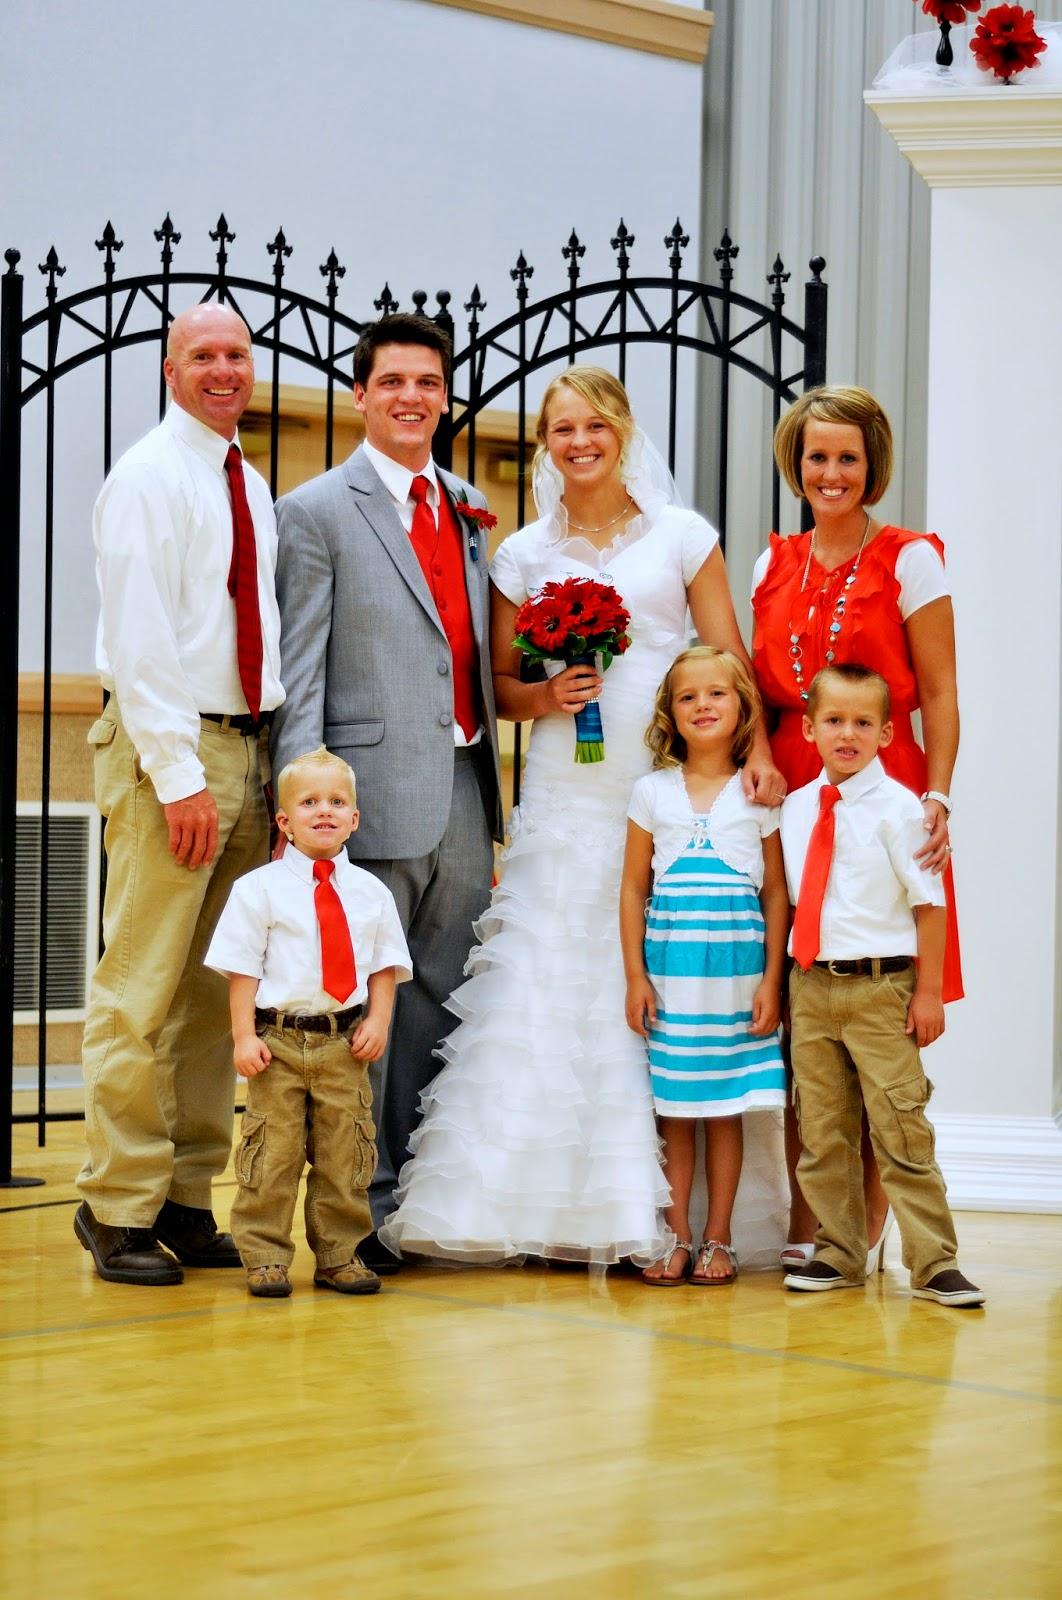 Mike daly wedding